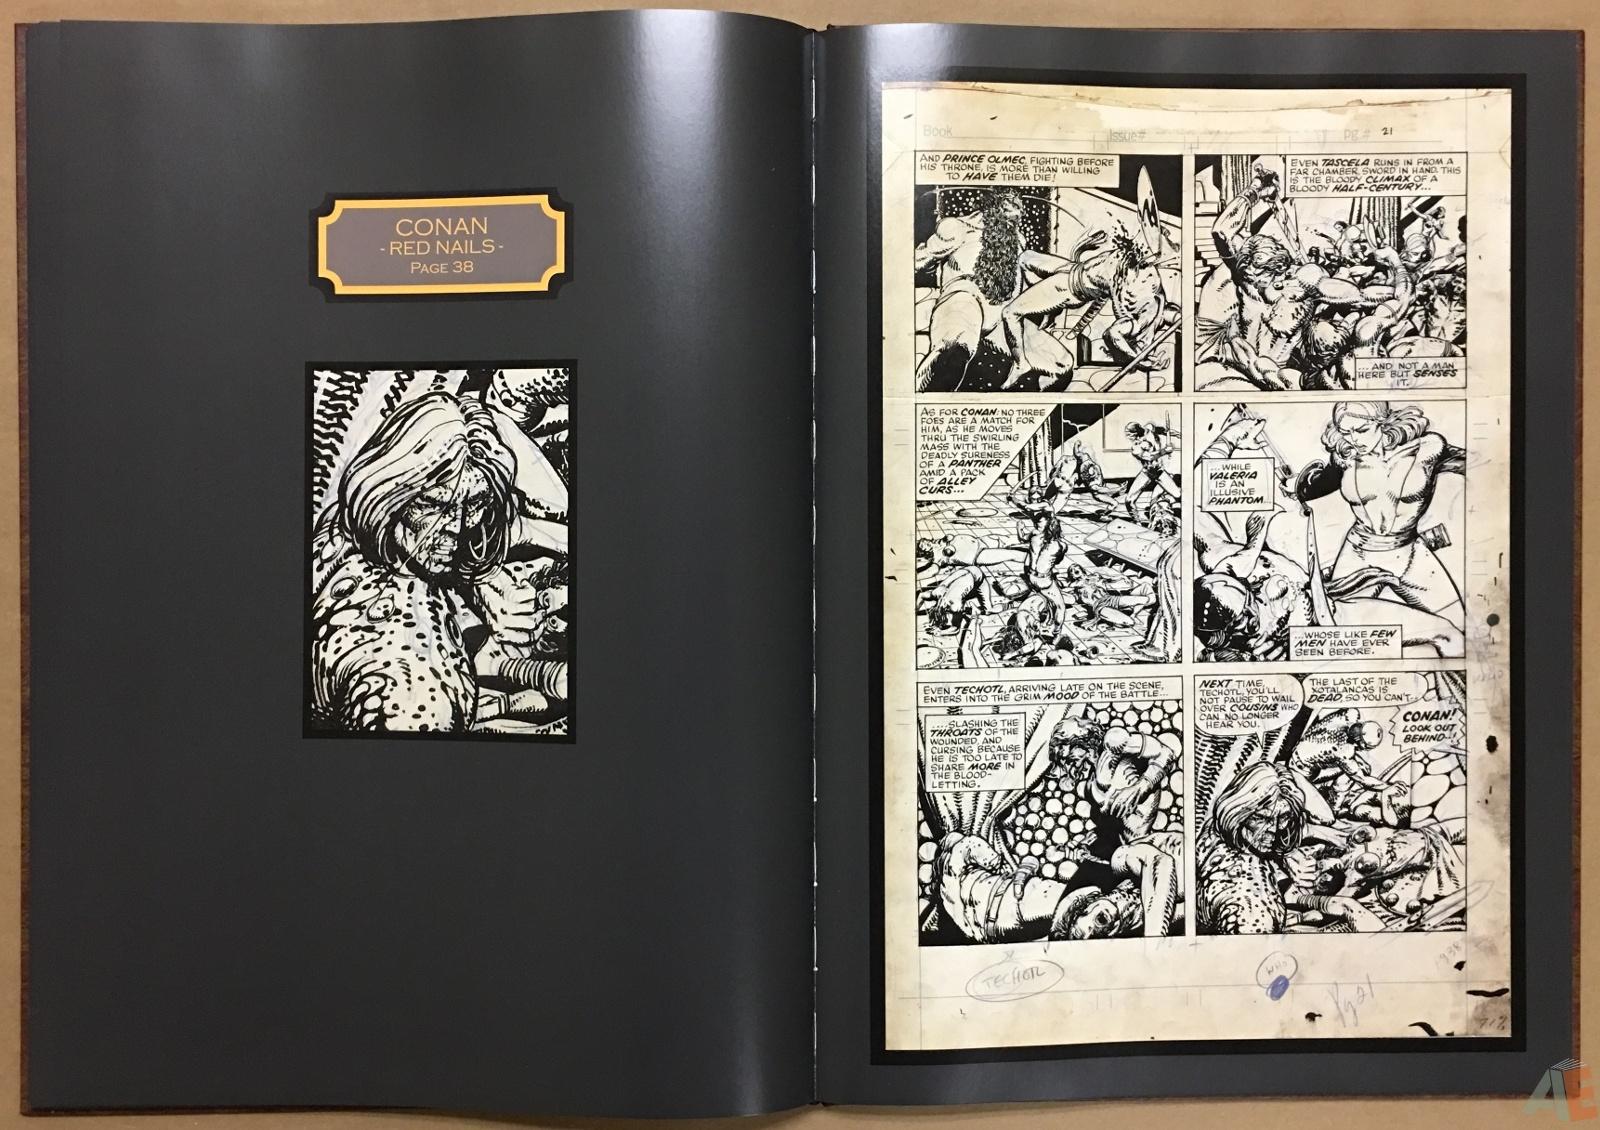 Conan: Red Nails Original Art Archives Volume 1 28